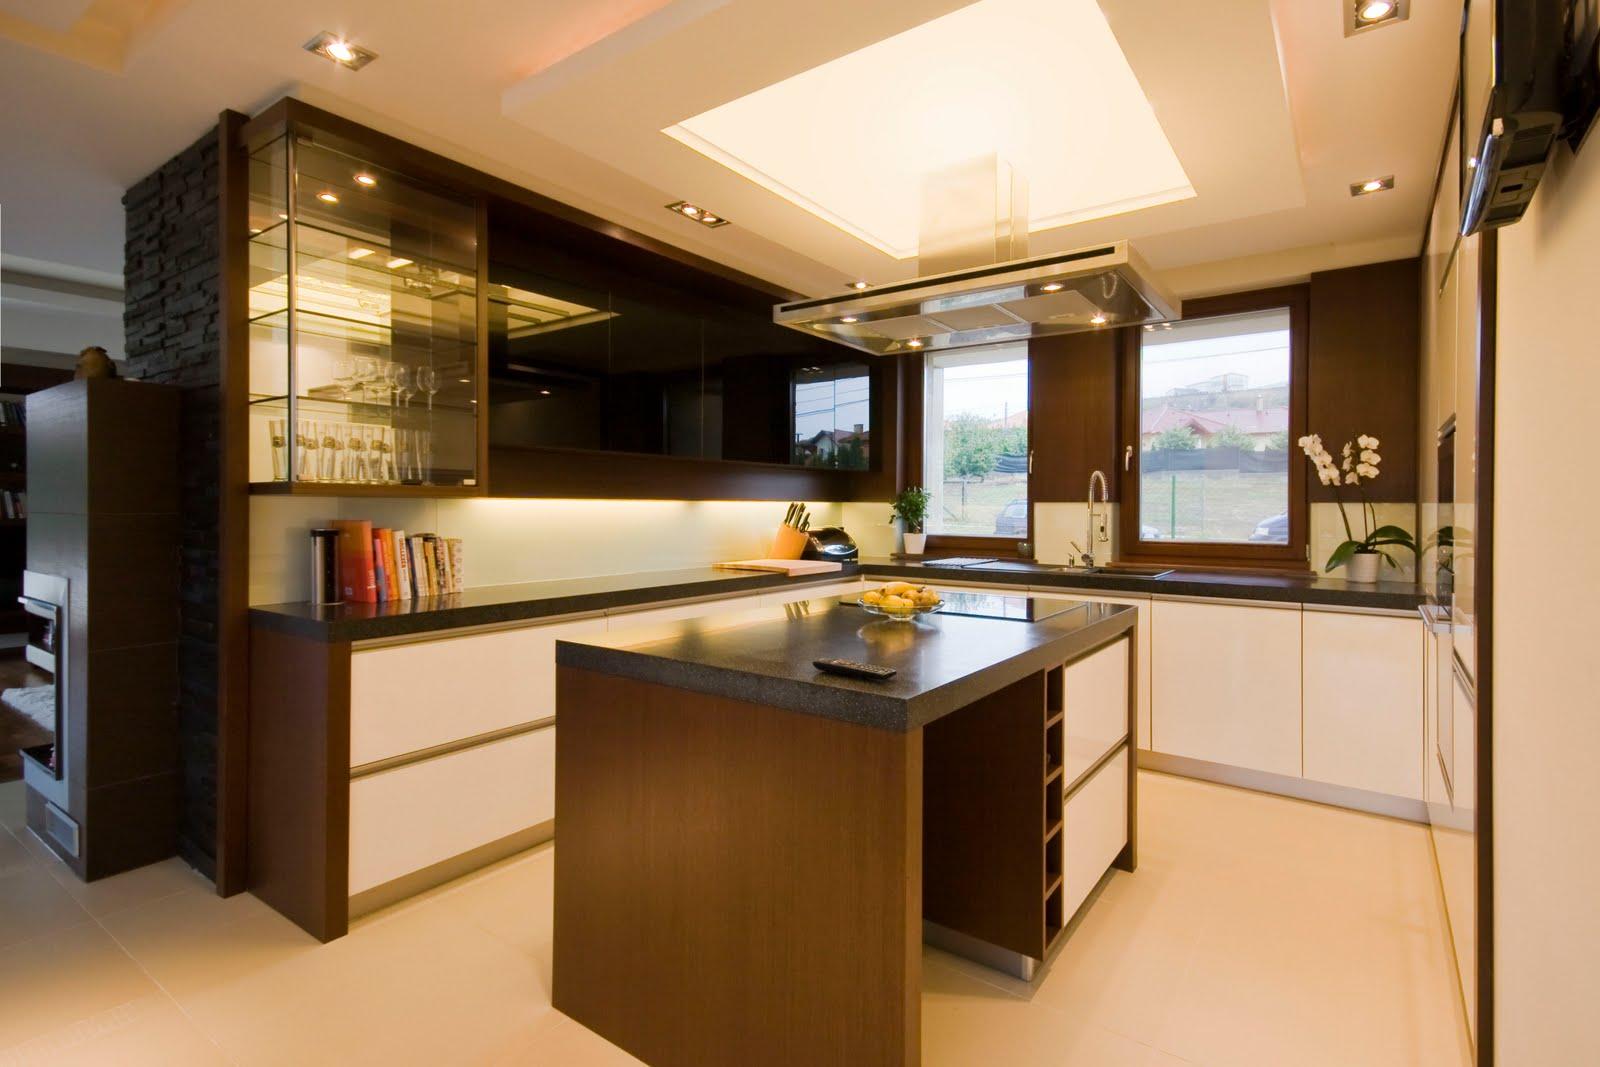 Modern and Luxurious Kitchen Design photo - 3